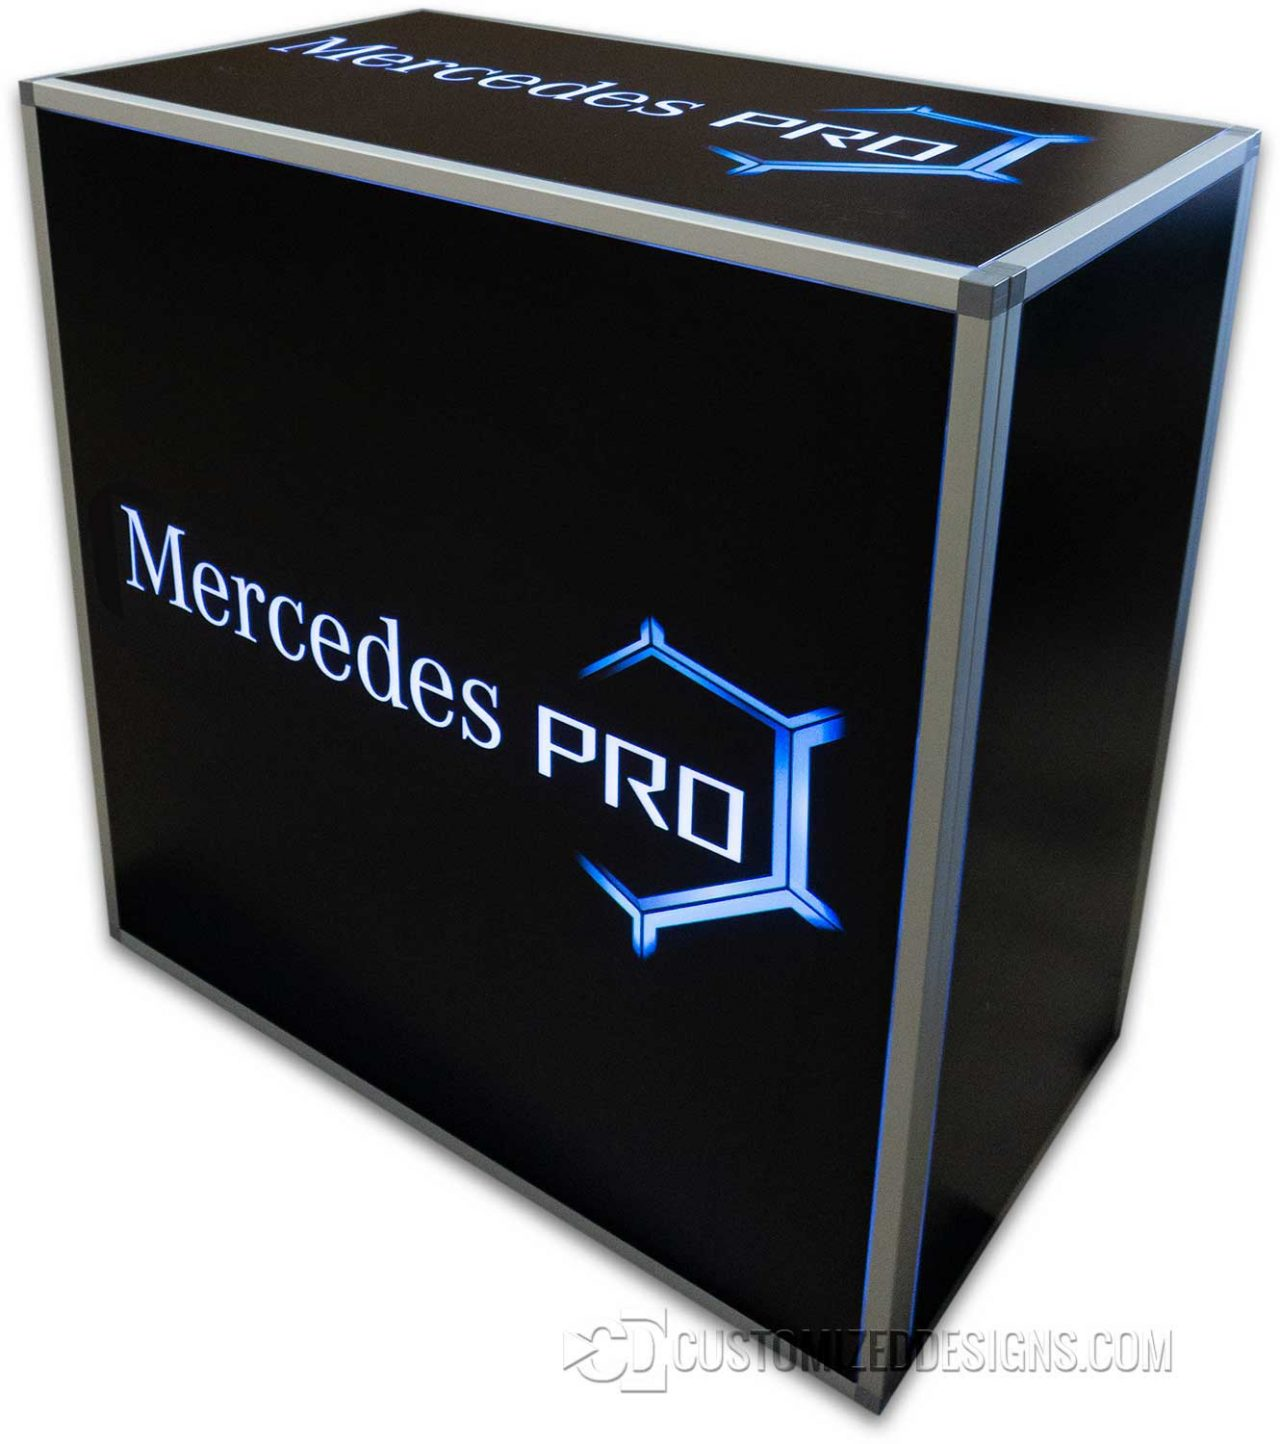 42x24x42 Element Modular Table - Mercedes Benz Logo